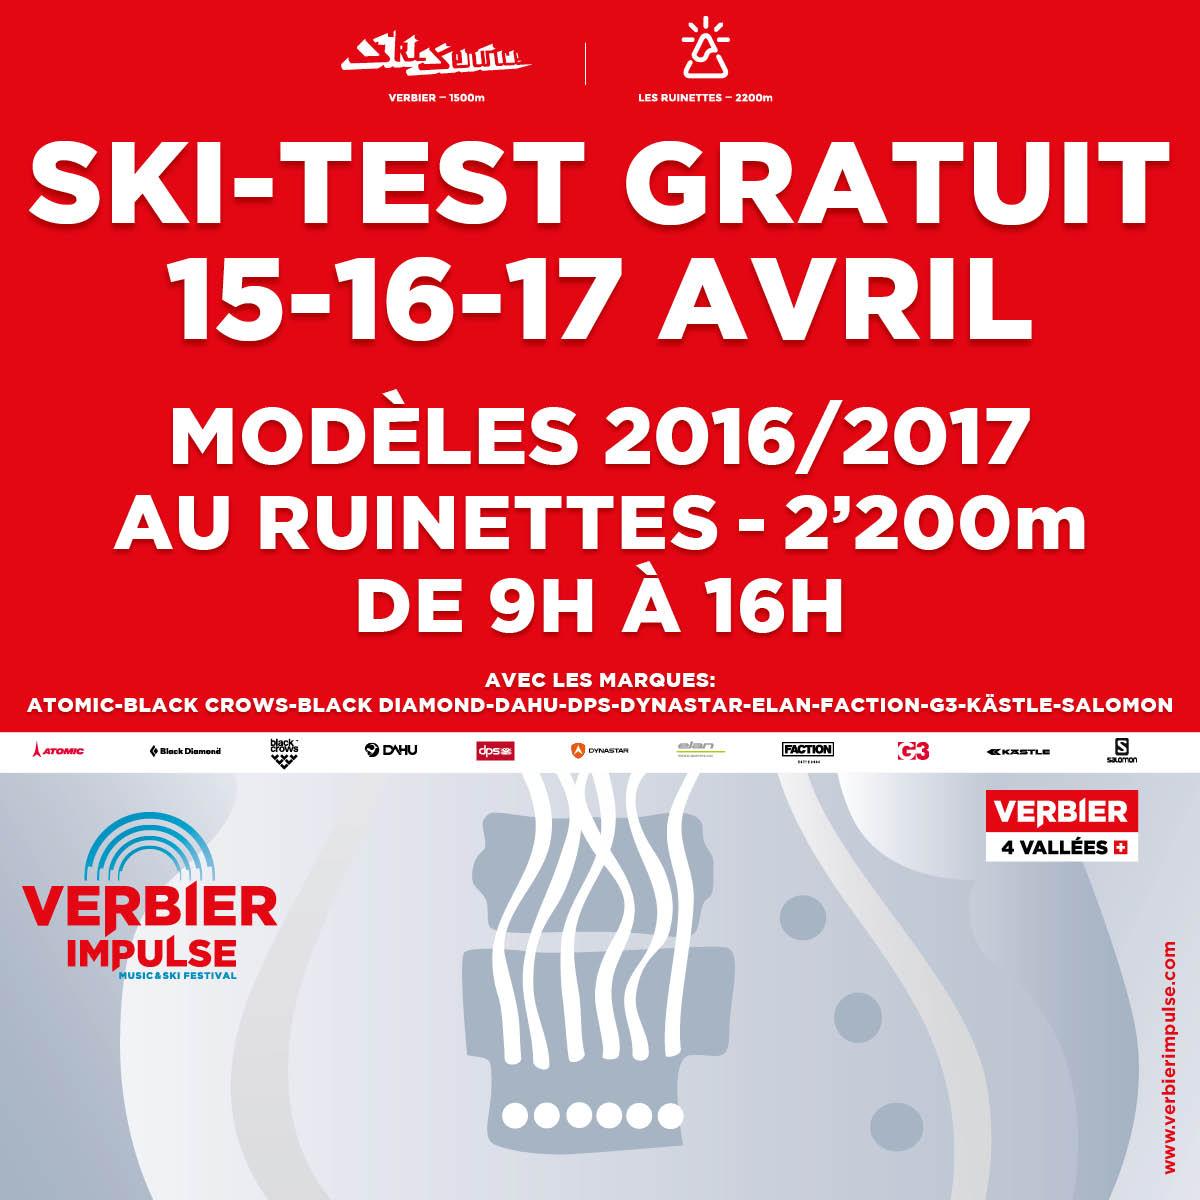 Free Verbier Impulse ski test at Les Ruinettes - Verbier. 2016/17 models from Atomic, Black Crows, Black Diamond, Dahu, DPS, Dynastar, Elan, Faction, G3, Kästle and Salomon